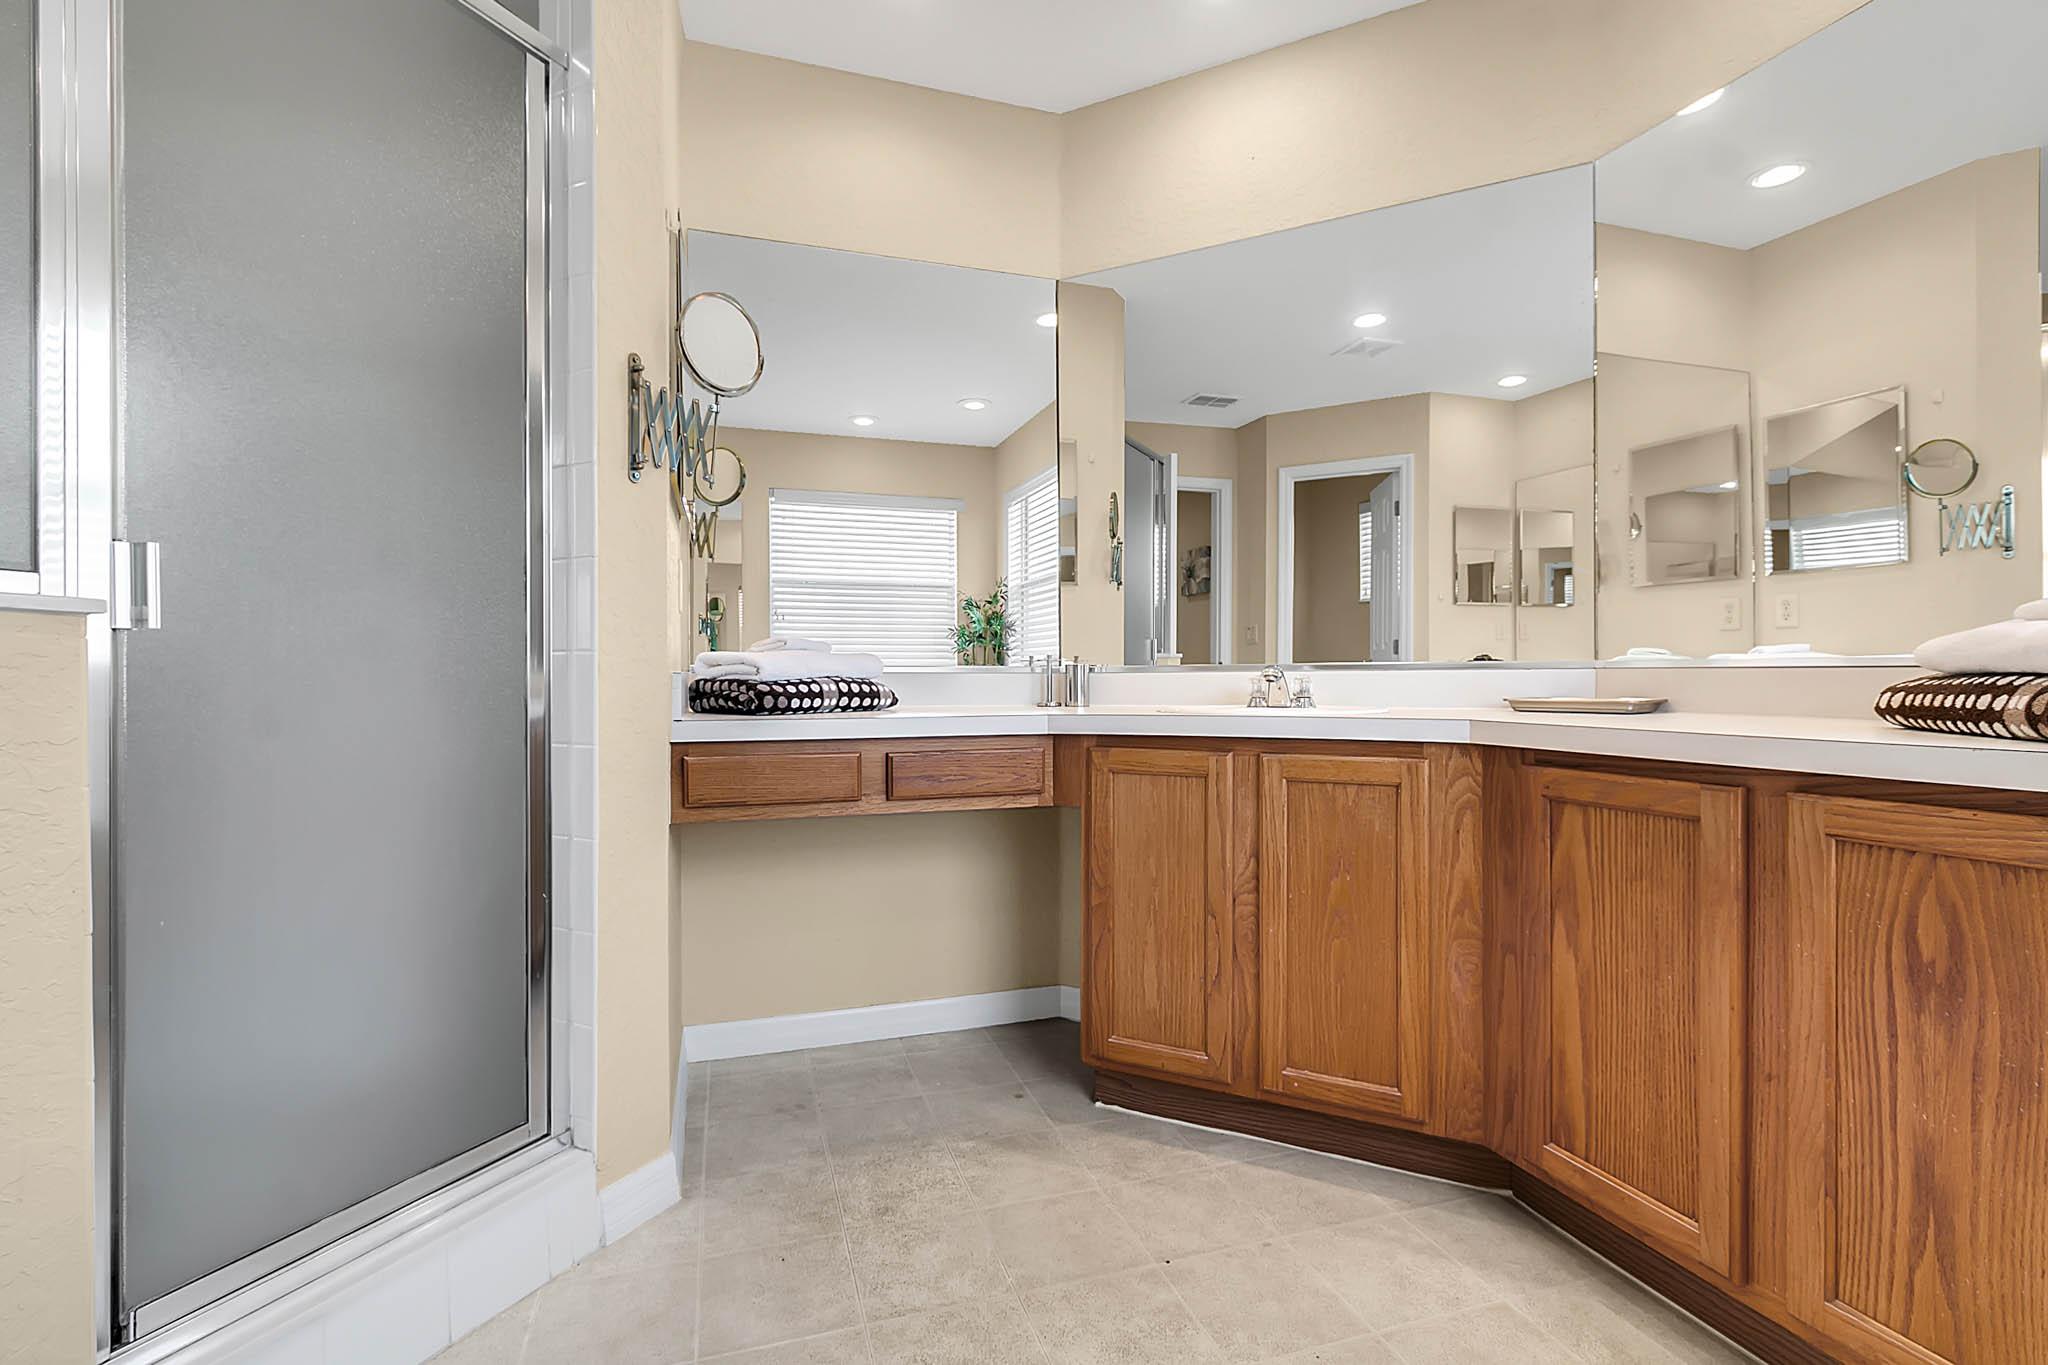 229-N-Hampton-Dr--Davenport--FL-33897----21---Master-Bathroom.jpg